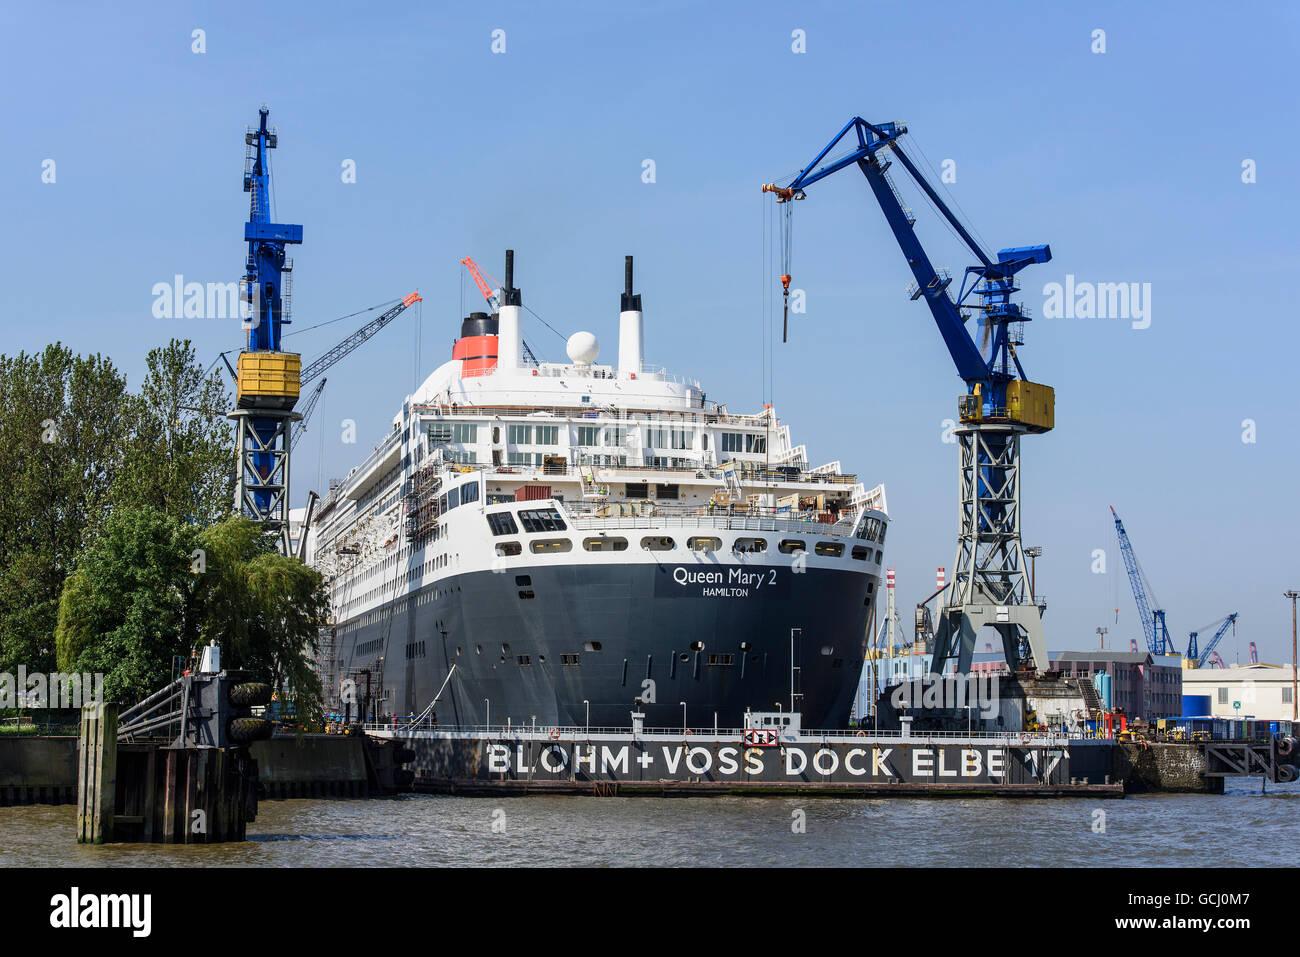 Kreuzer Queen Mary 2 im Trockendock, St. Pauli, Hamburg, Deutschland Stockbild